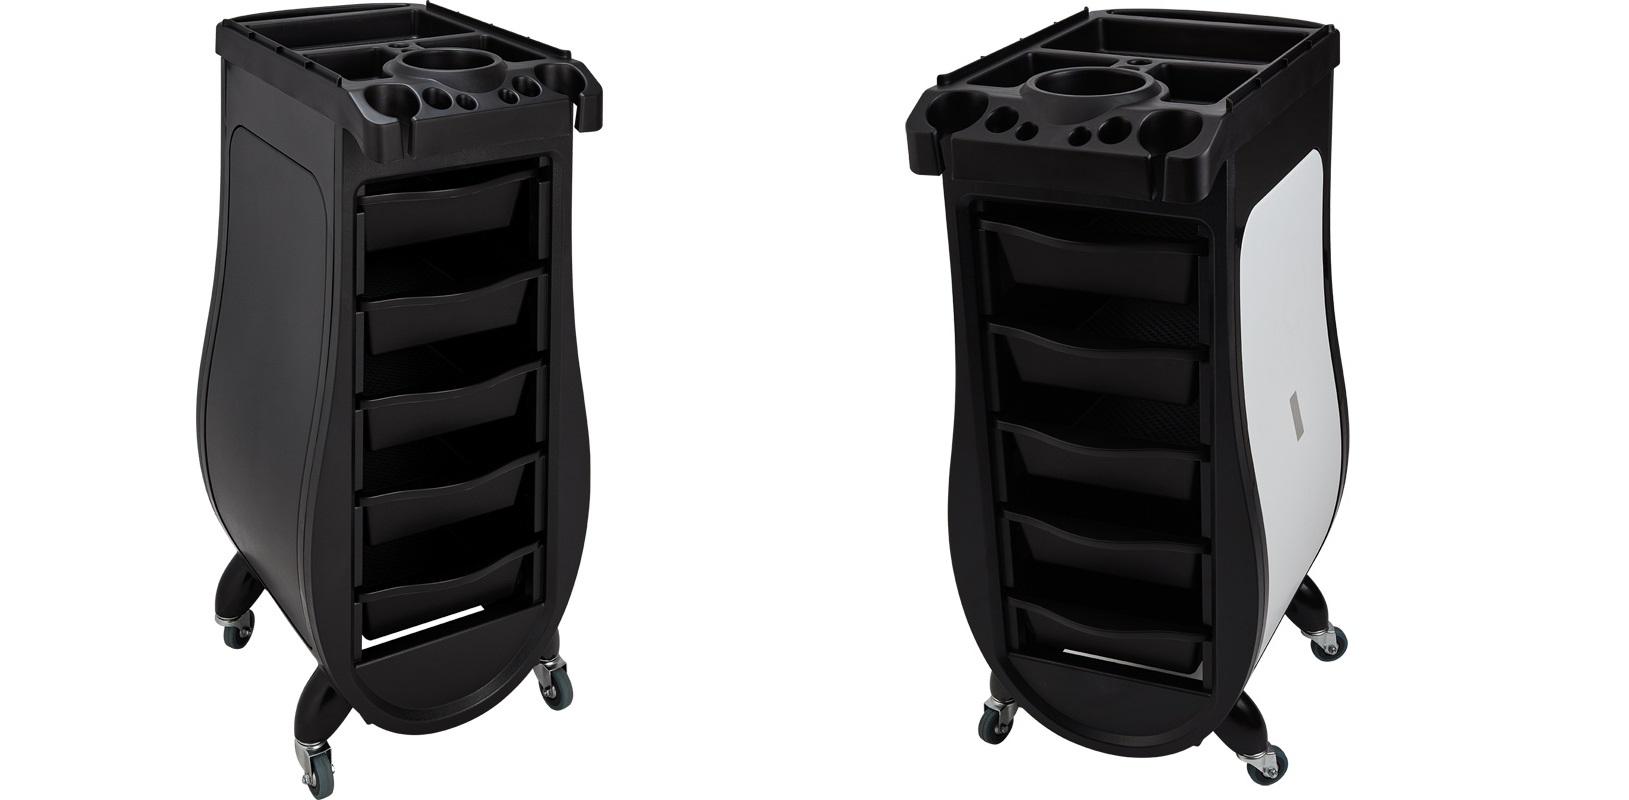 Arbetsvagn Signorina Design svart eller svart vit